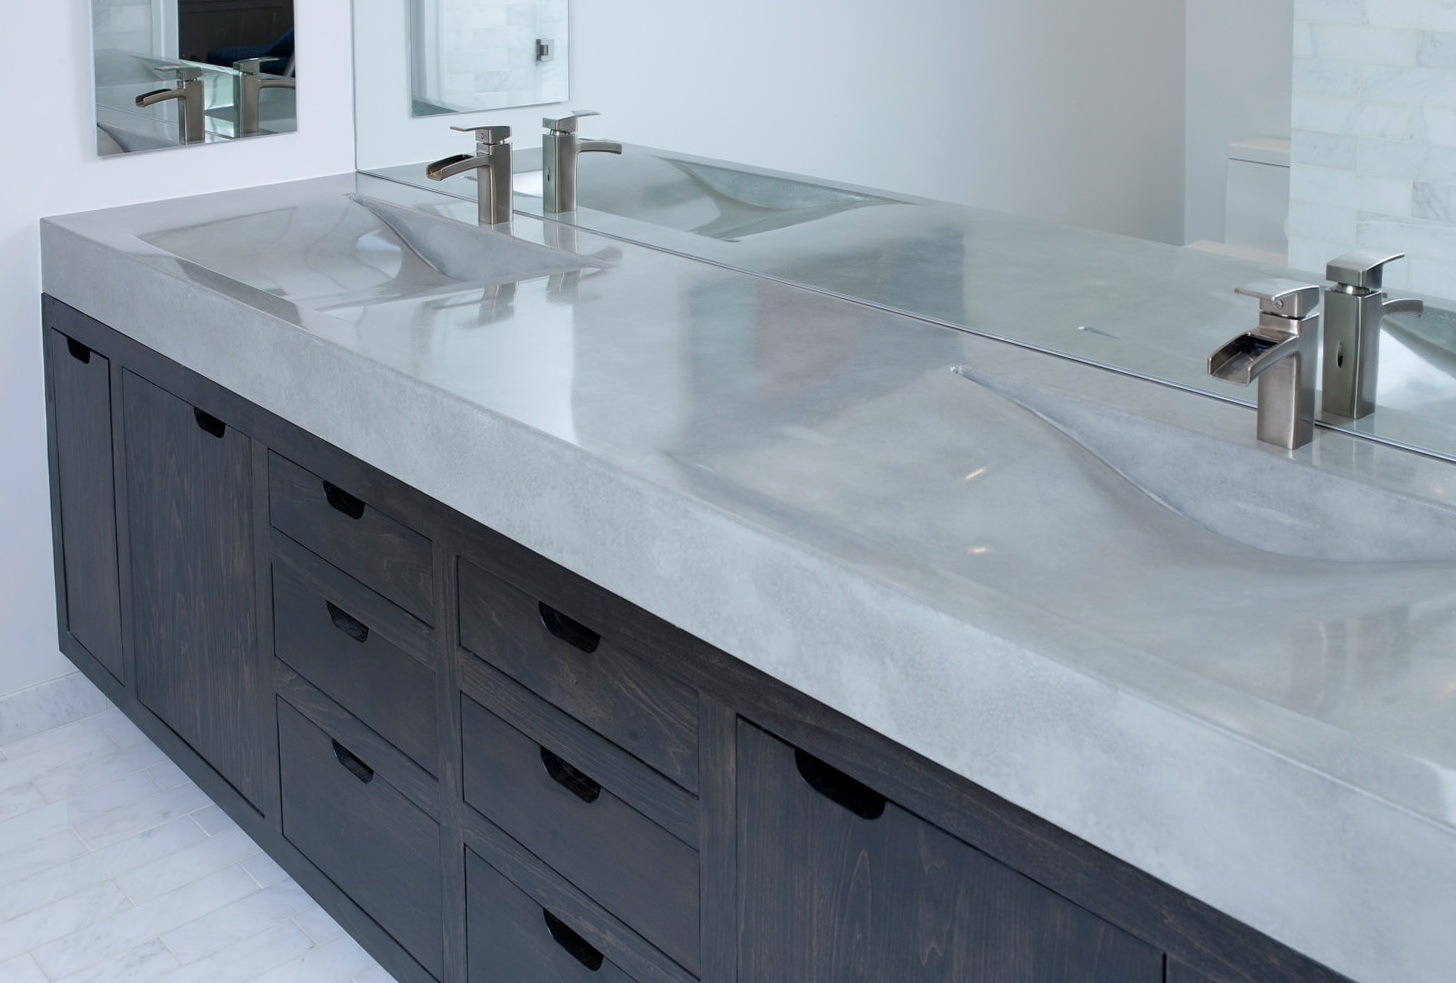 Concrete Vanity Top With Sink